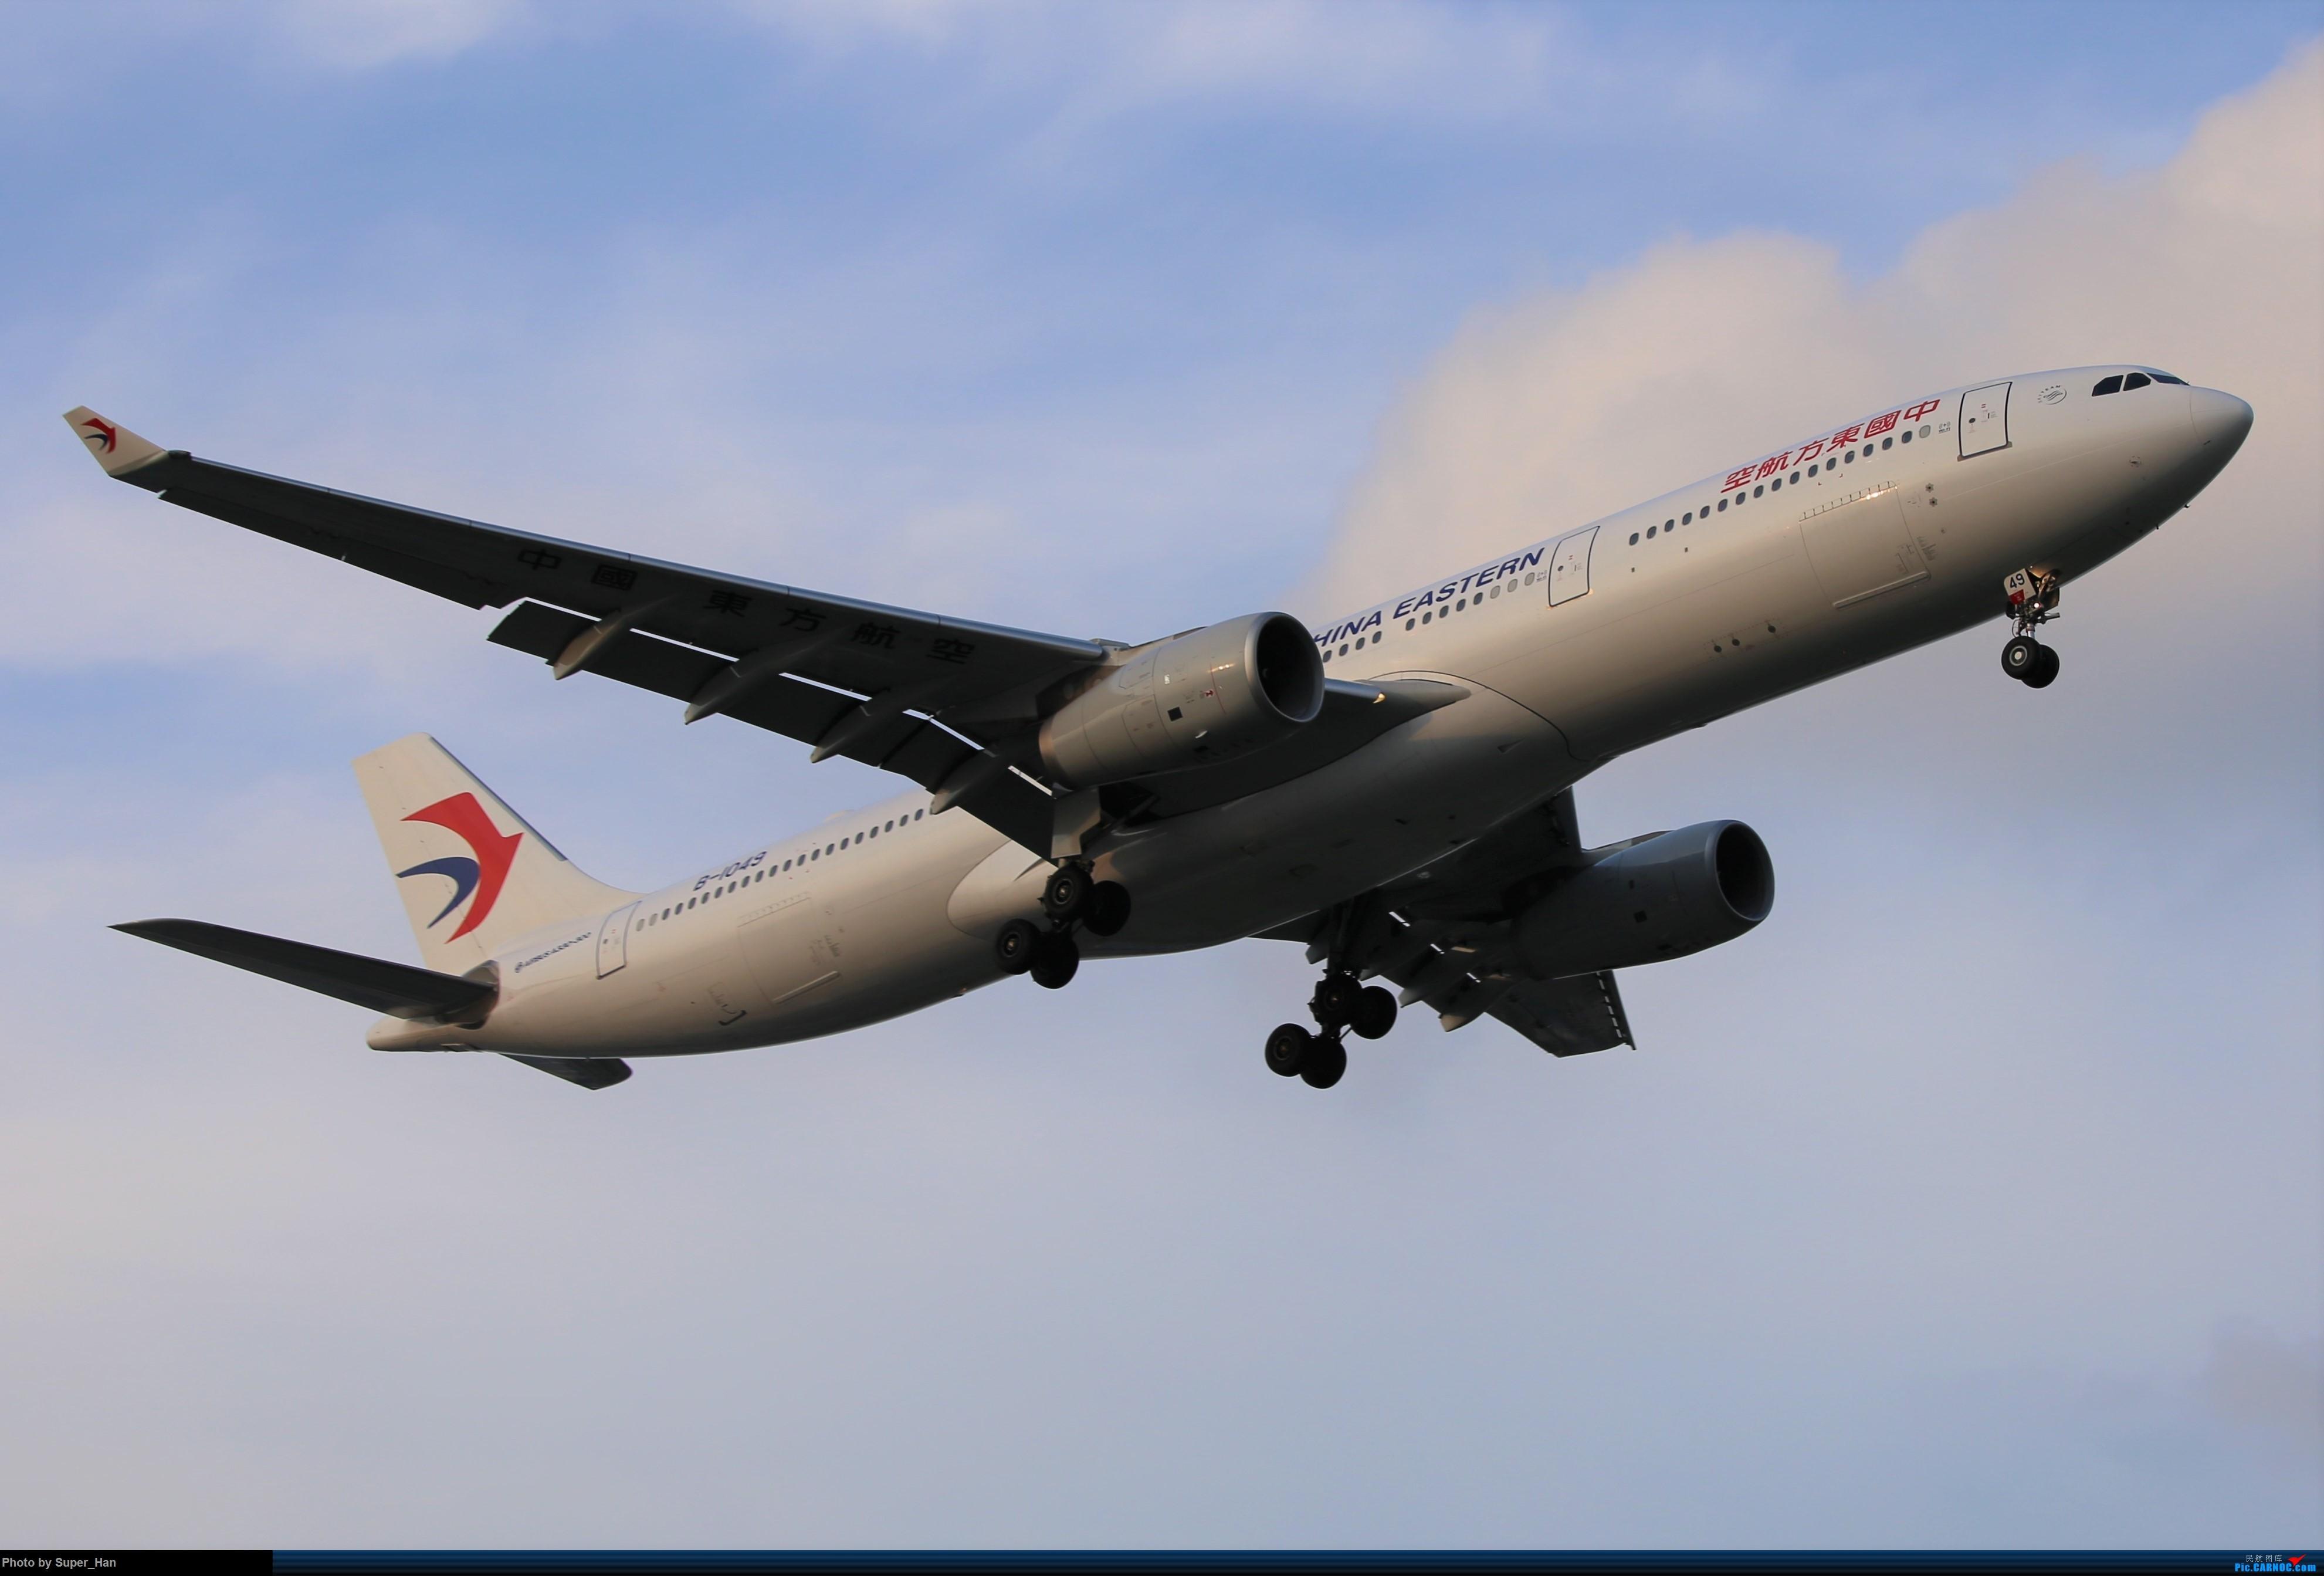 Re:[原创]0715去虹桥说走就走【最多的330篇】 AIRBUS A330-300 B-1049 中国上海虹桥国际机场